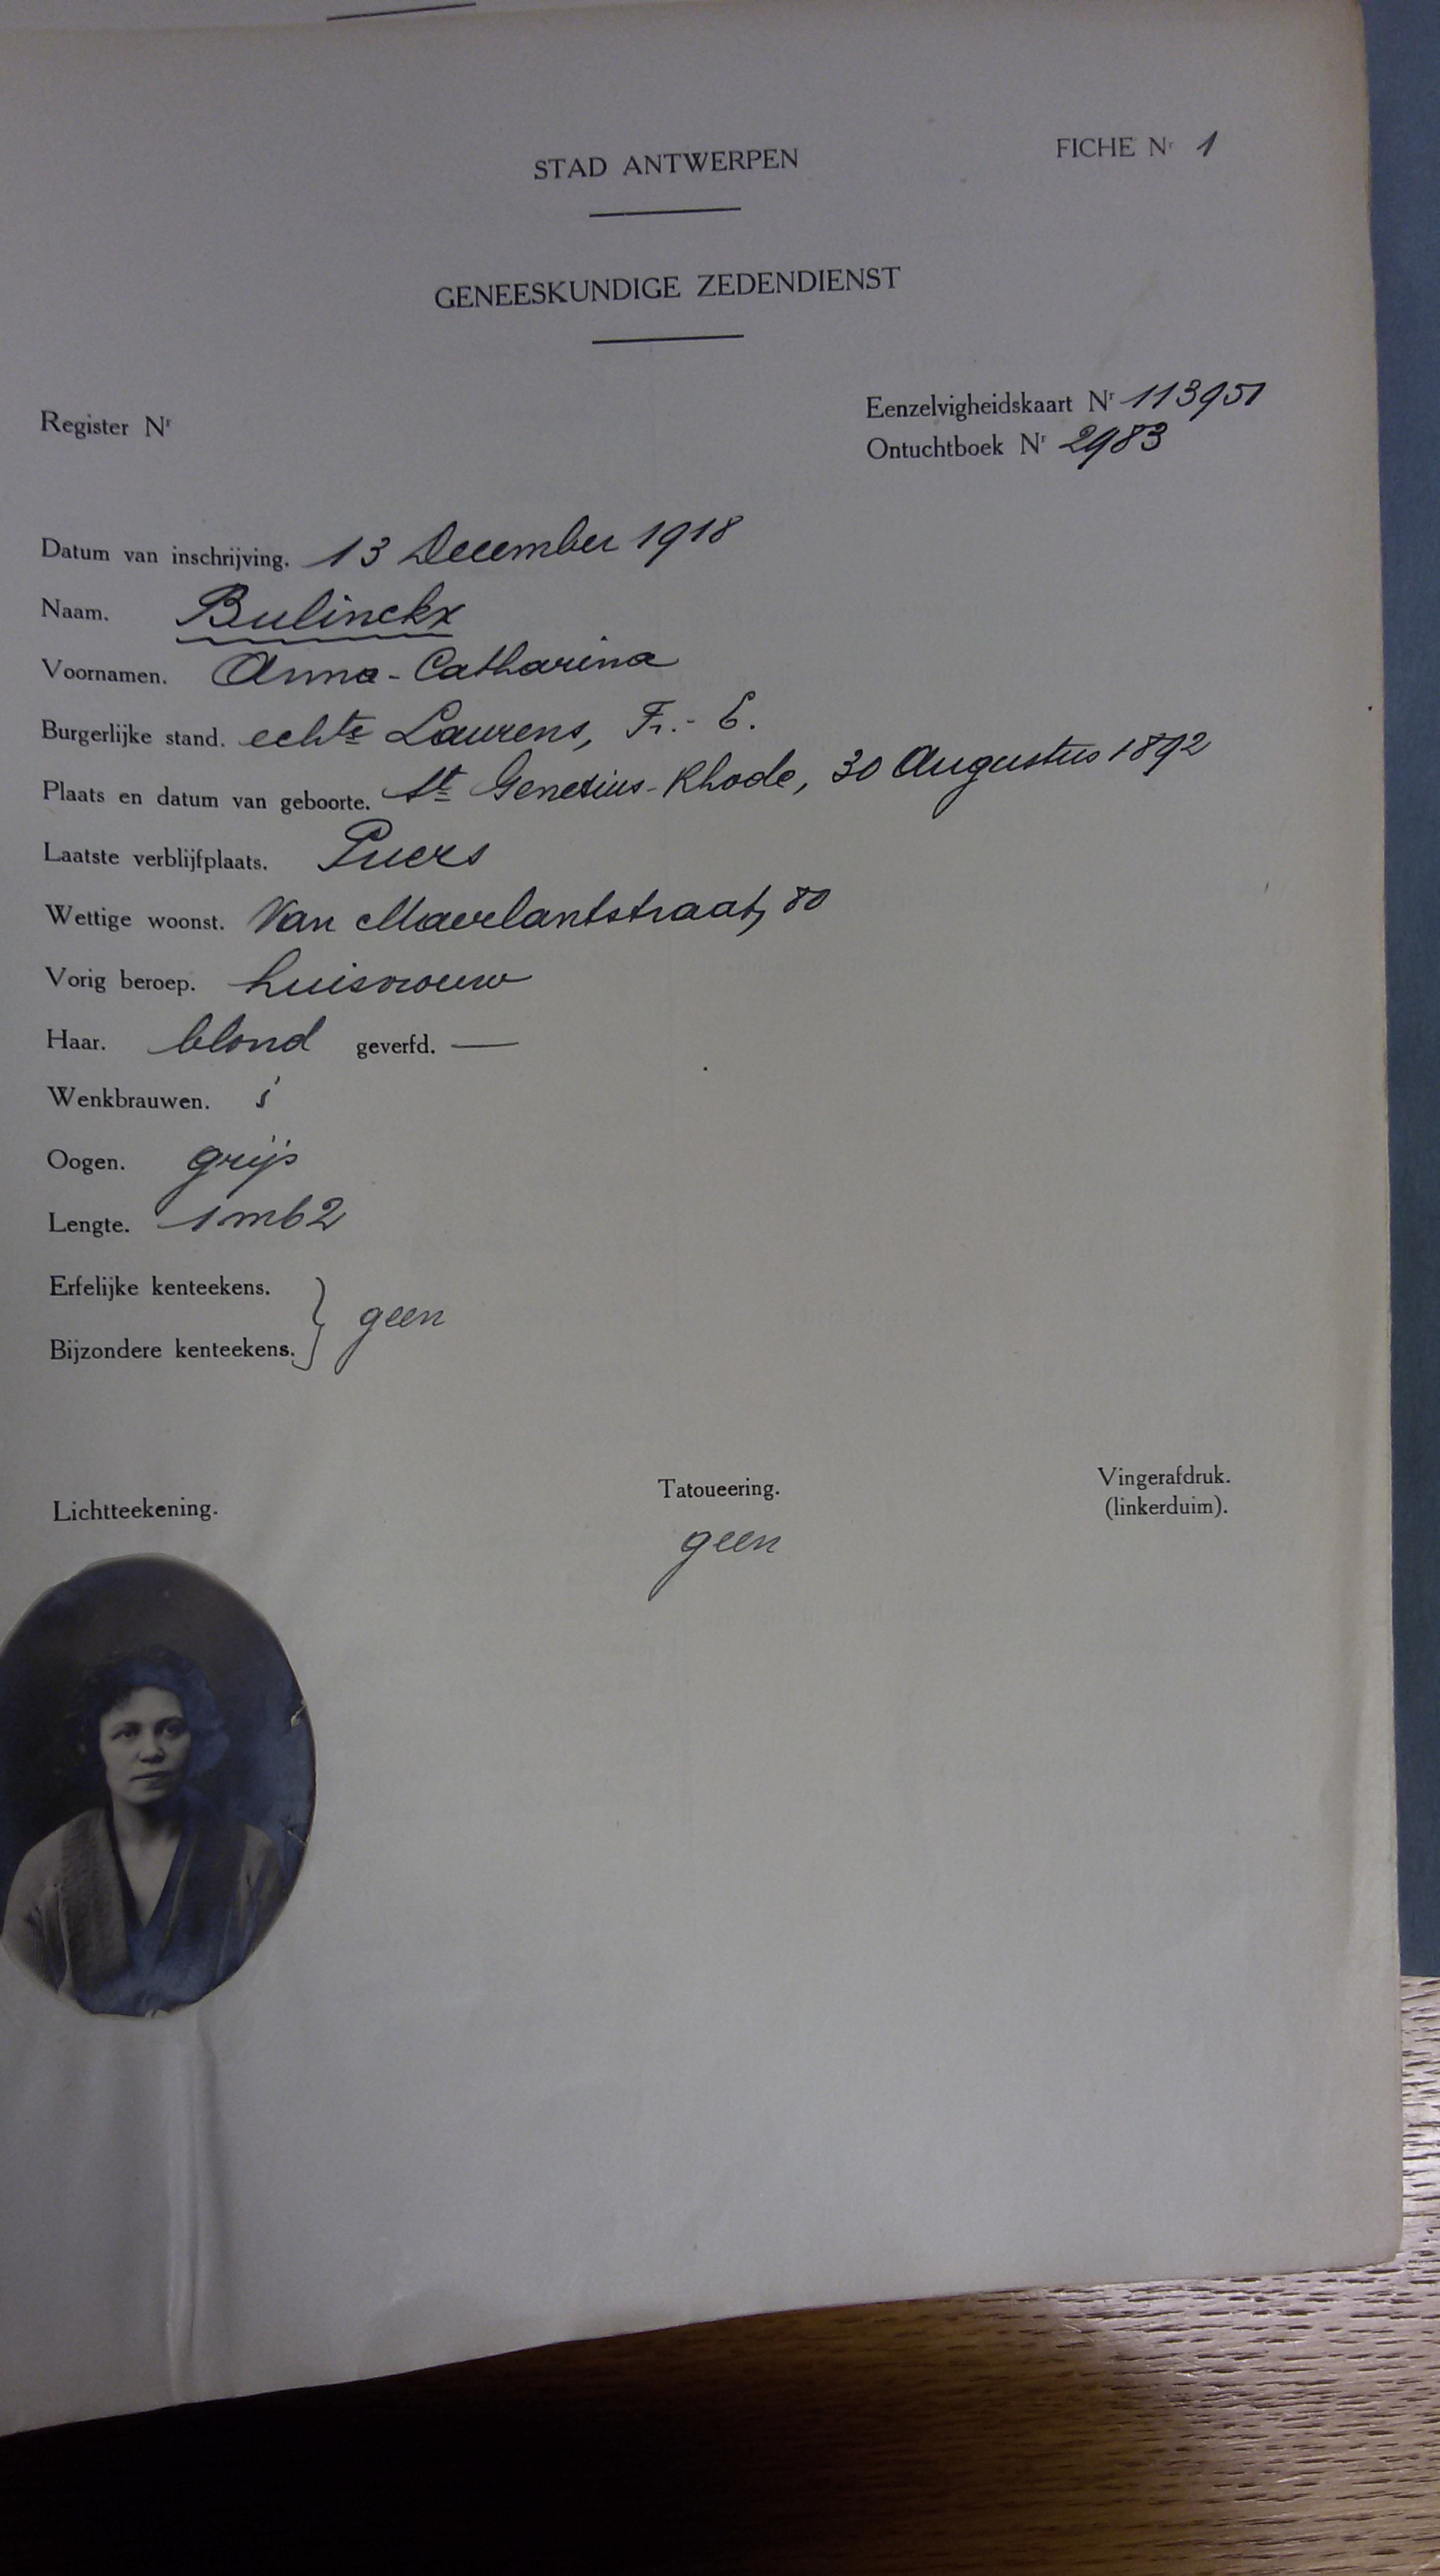 Anna Catharina Bulinckx